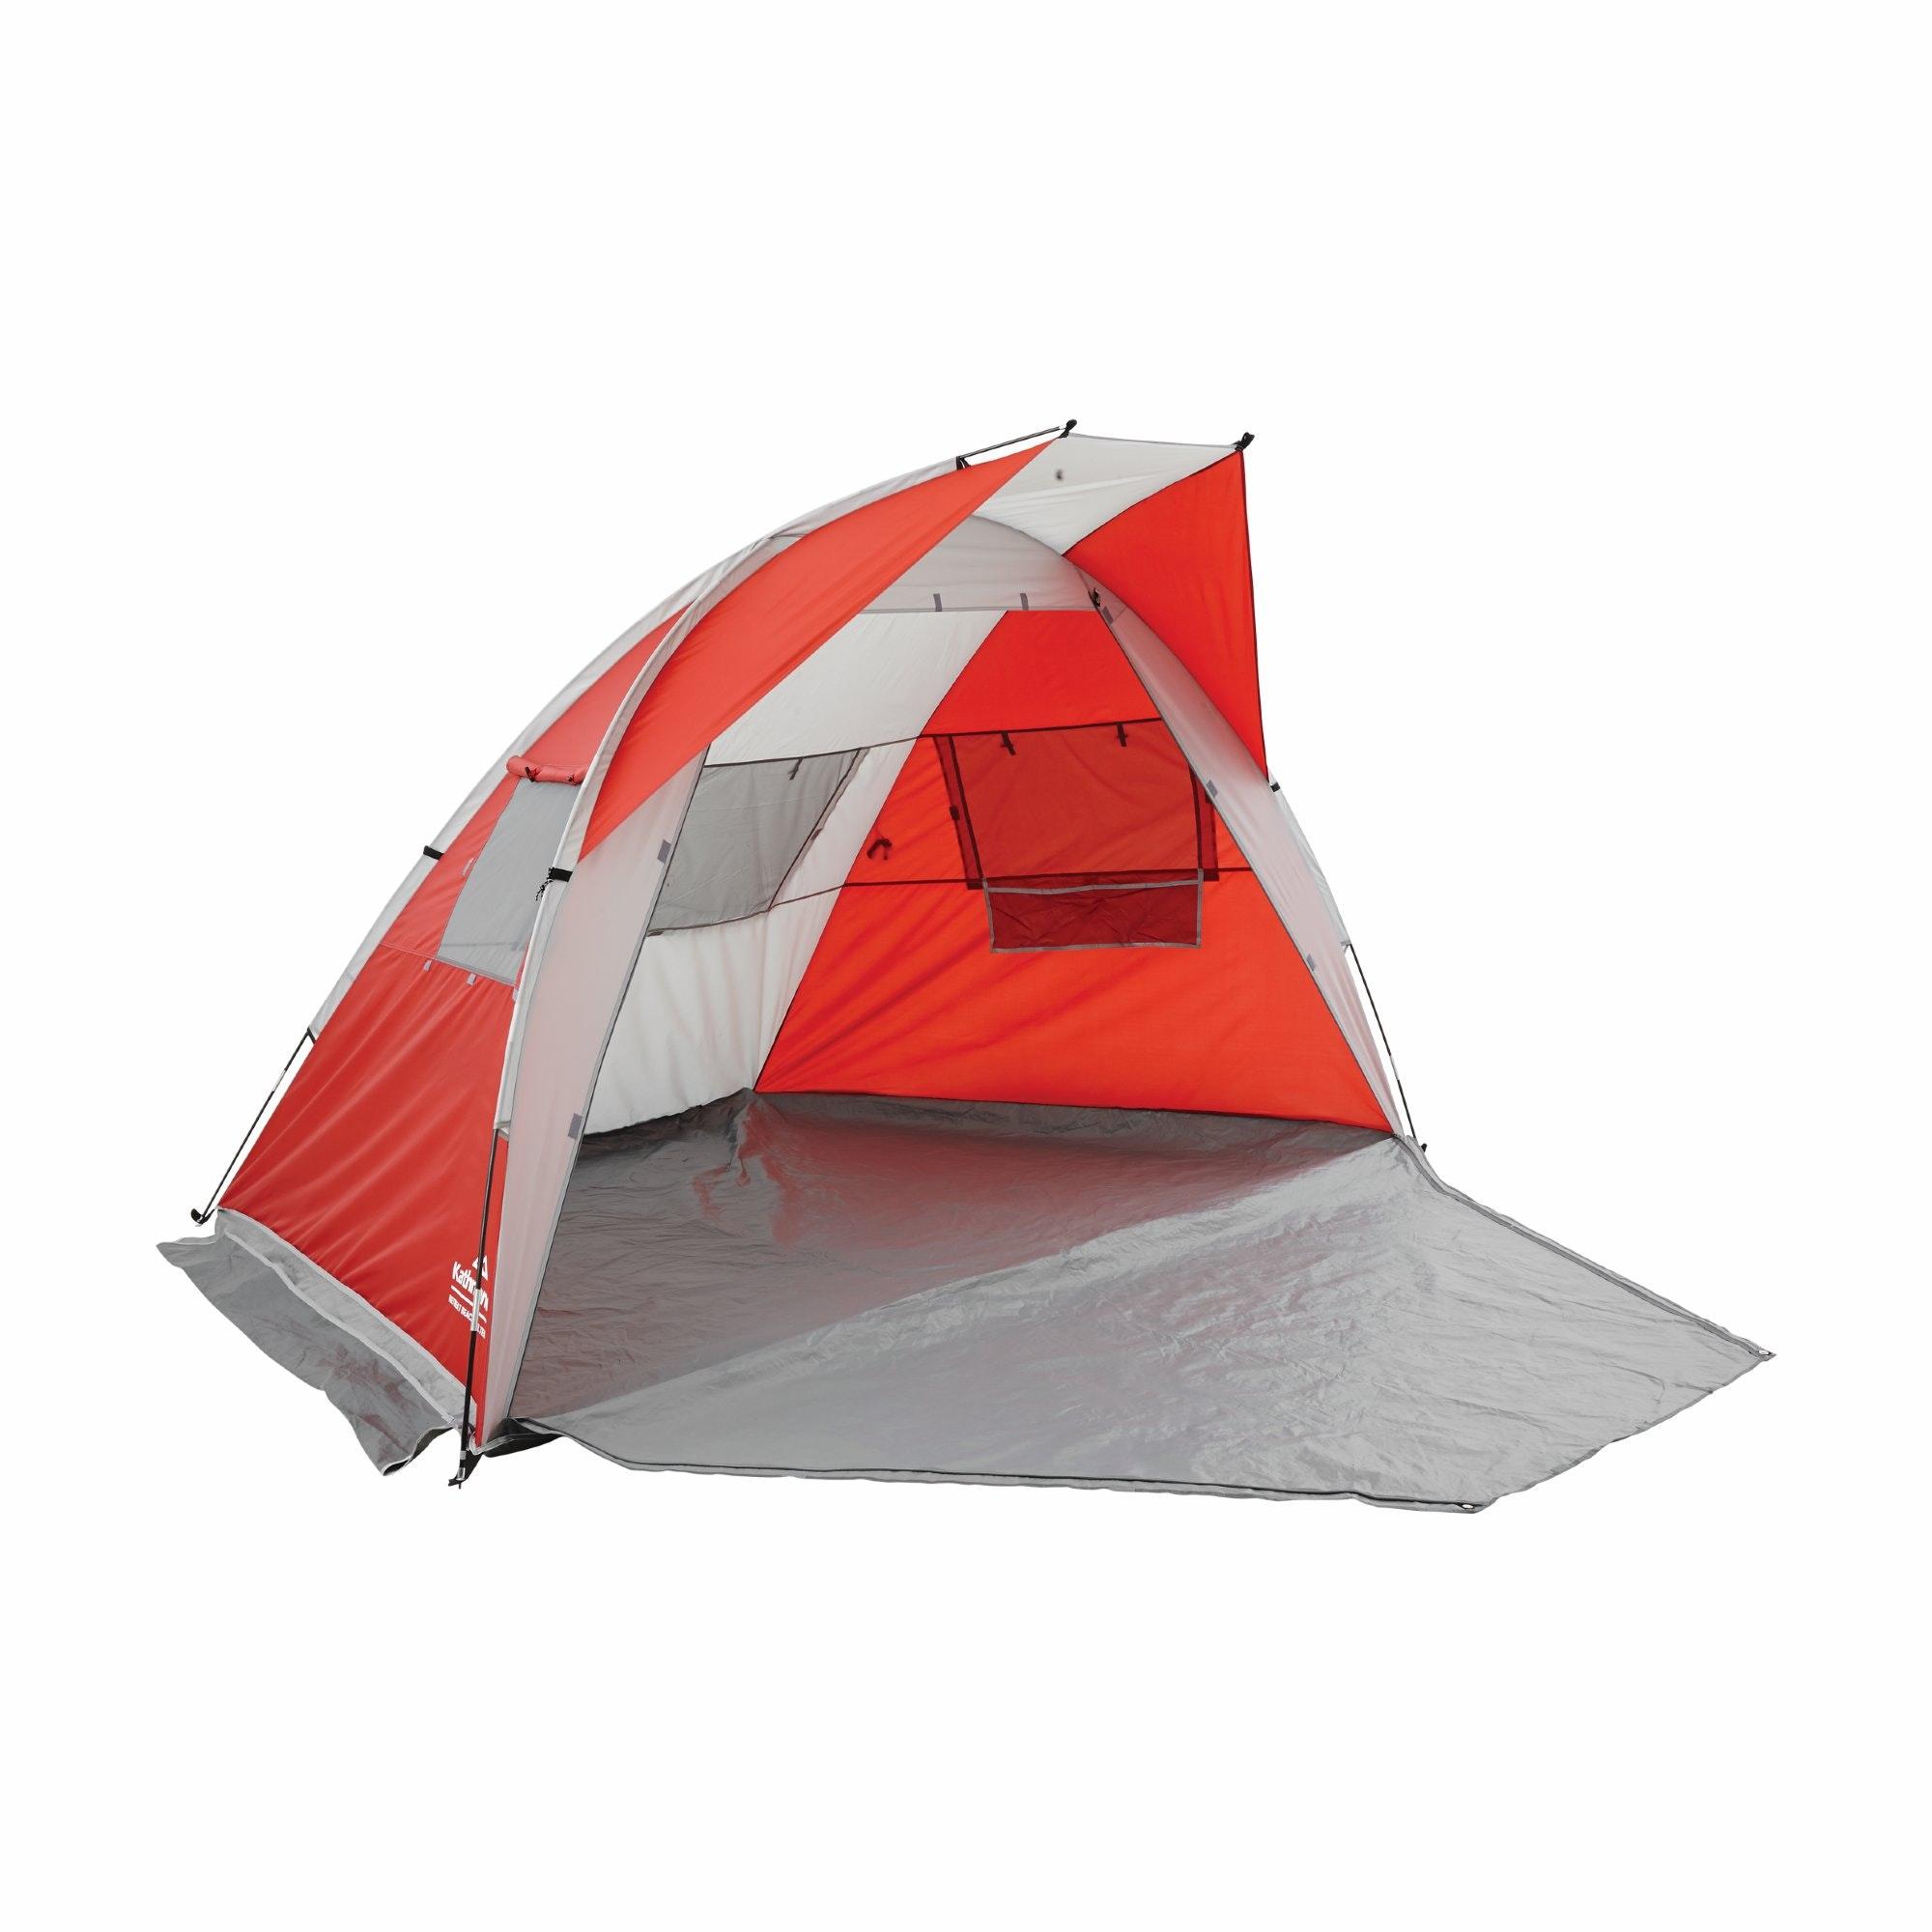 453  sc 1 st  Kathmandu & Retreat Family Beach Shelter v3 - Red/Grey